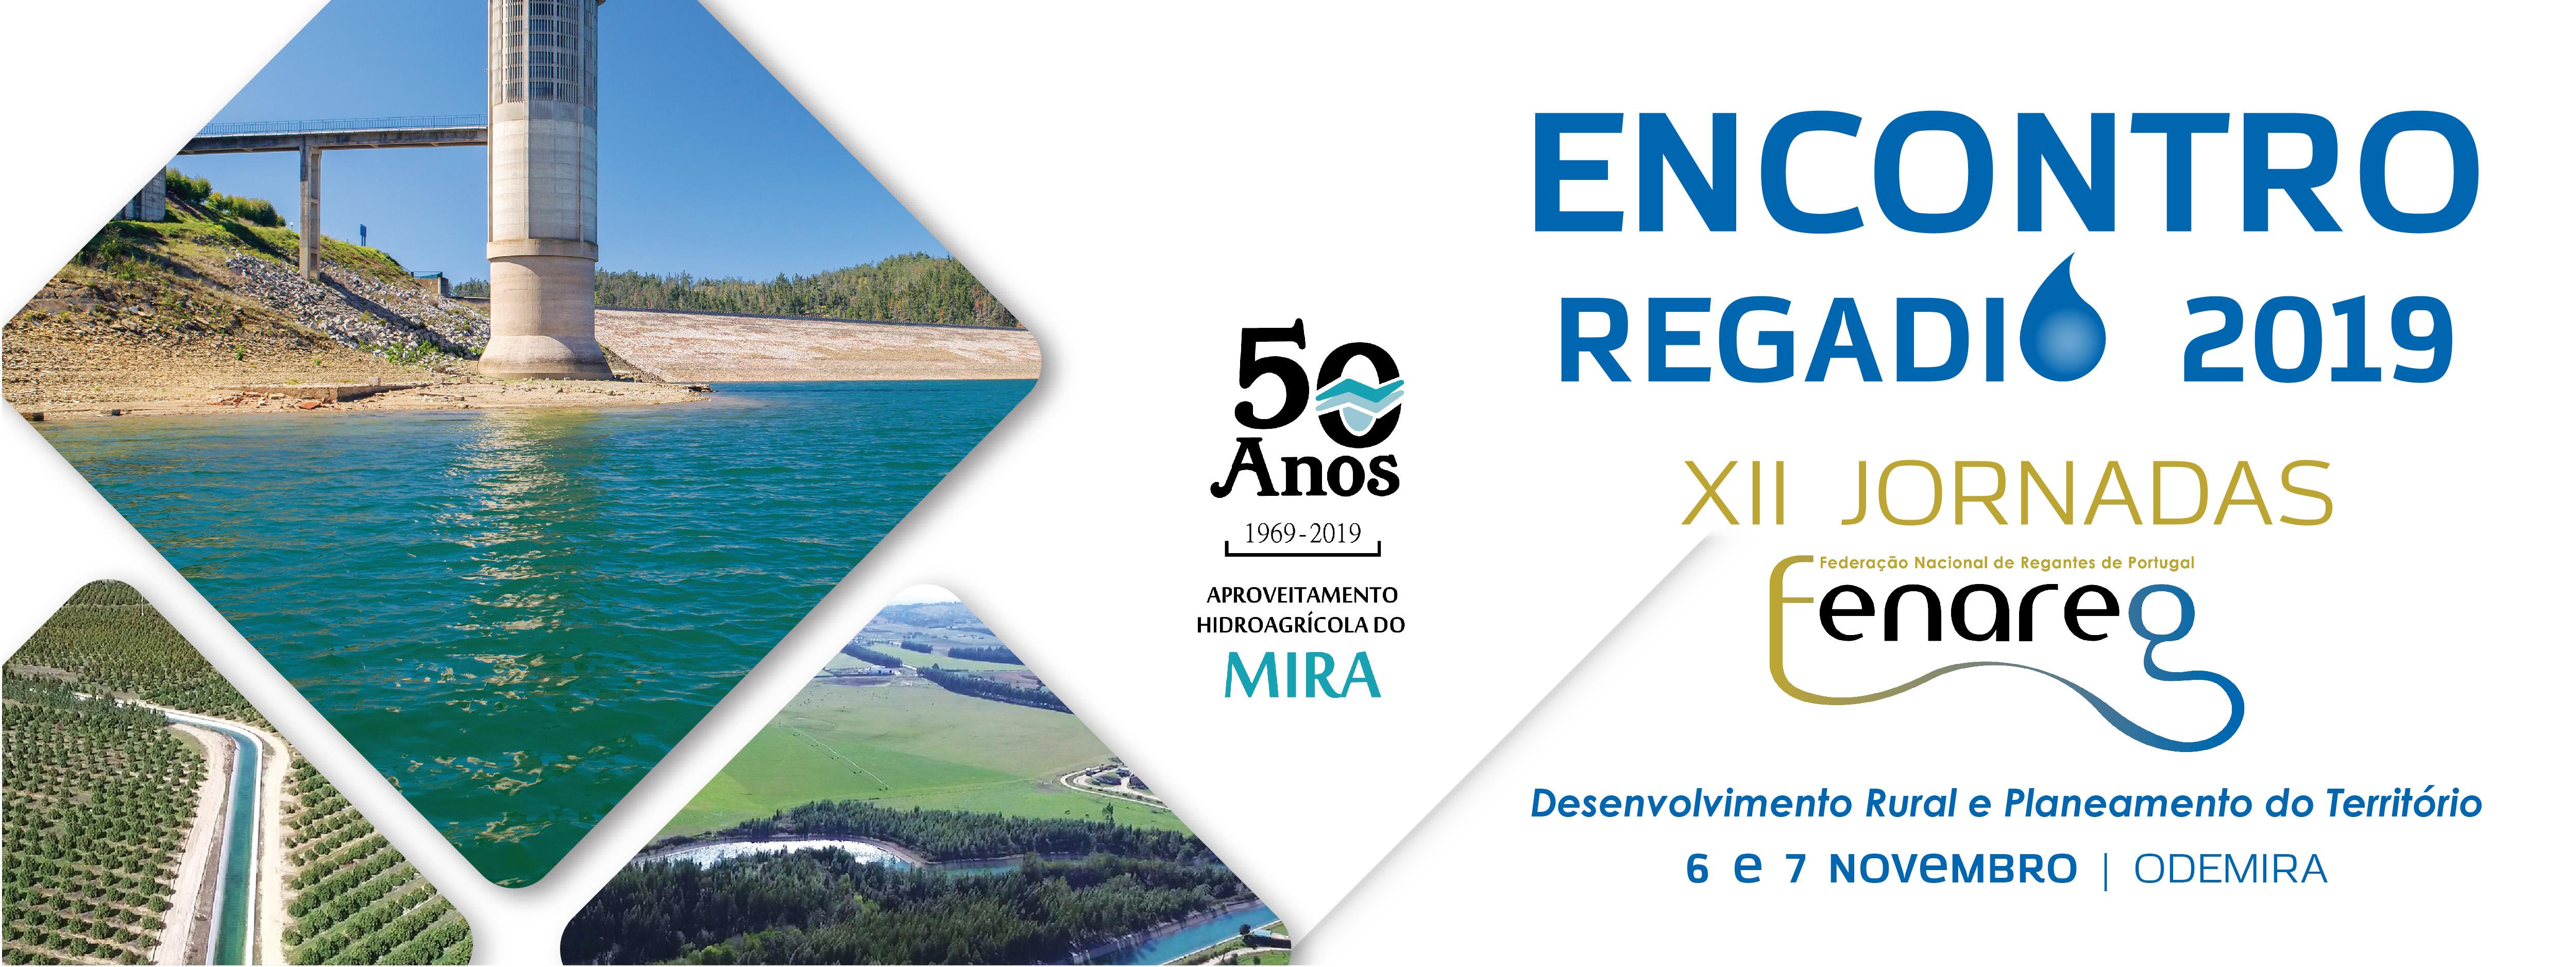 Encontro Regadio 2019 - XII Jornadas Fenareg e 50 anos do Aproveitamento Hidroagricola do Mira -  6 e 7 de novembro